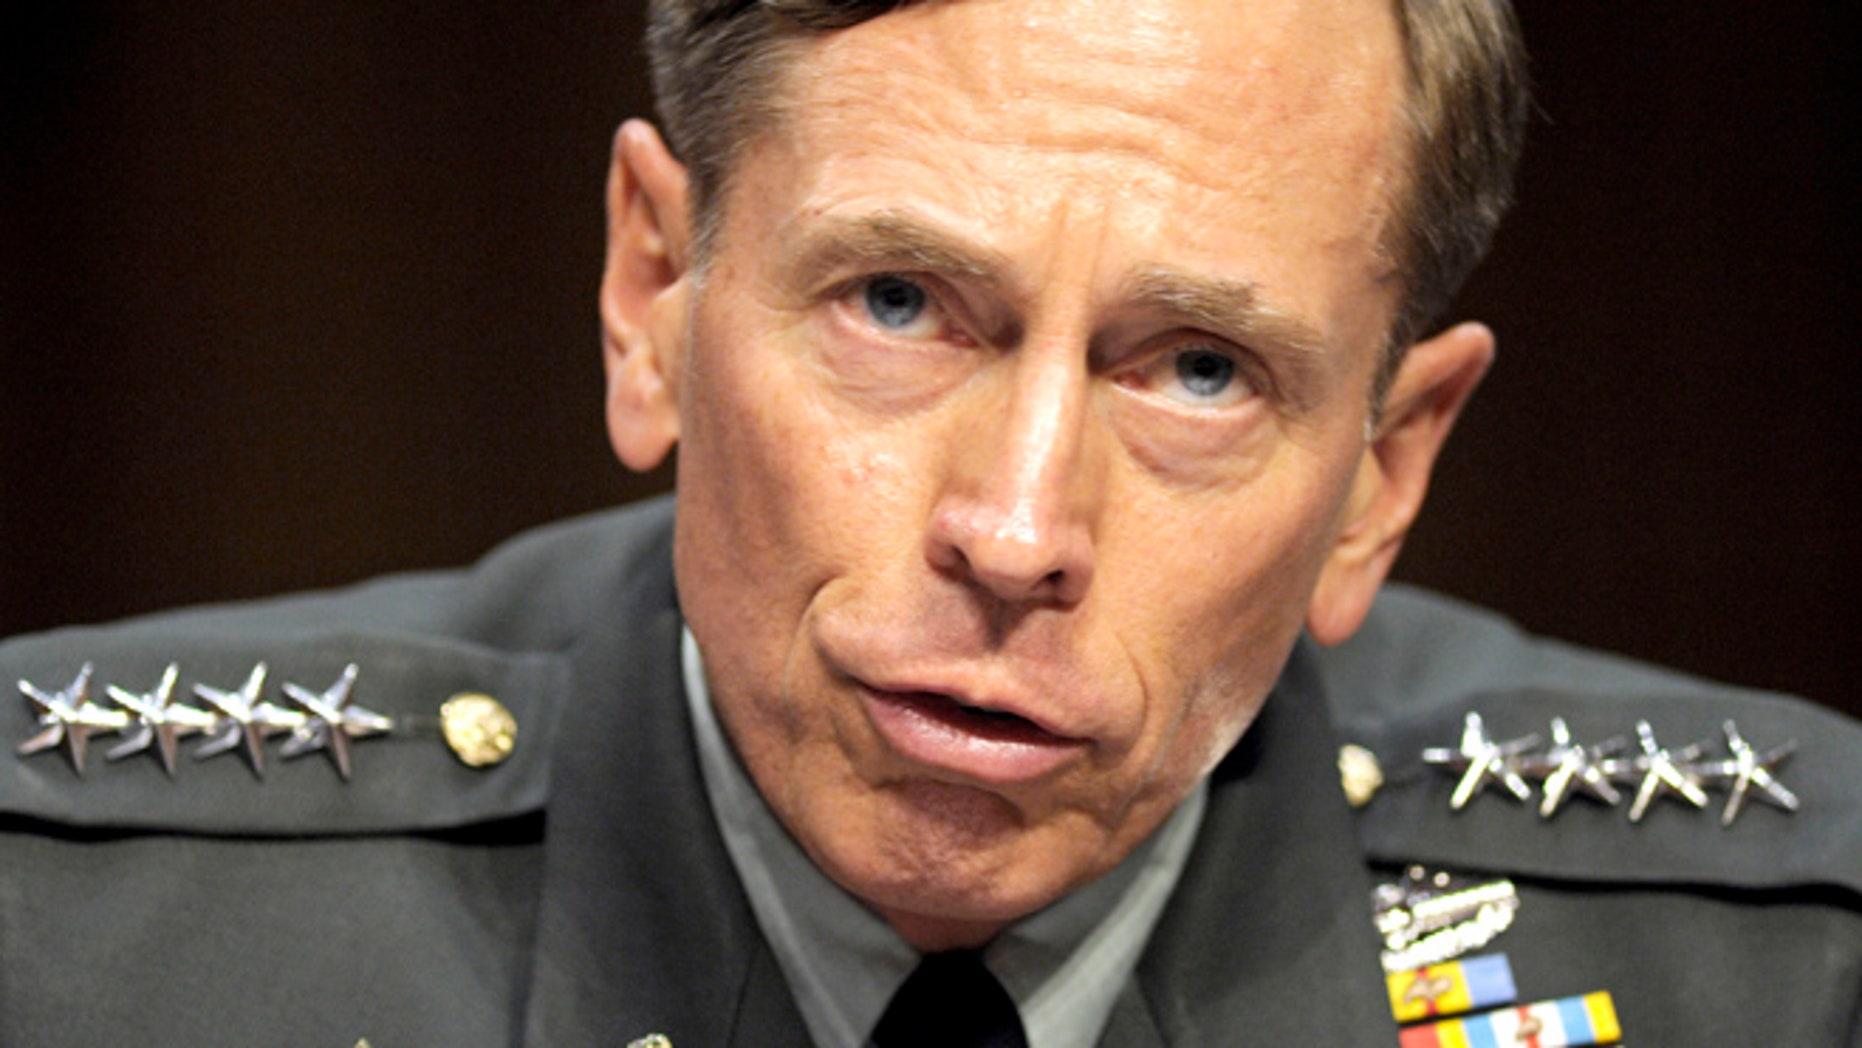 June 23, 2011: Then-CIA Director-desigate Gen. David Petraeus testifies on Capitol Hill in Washington.